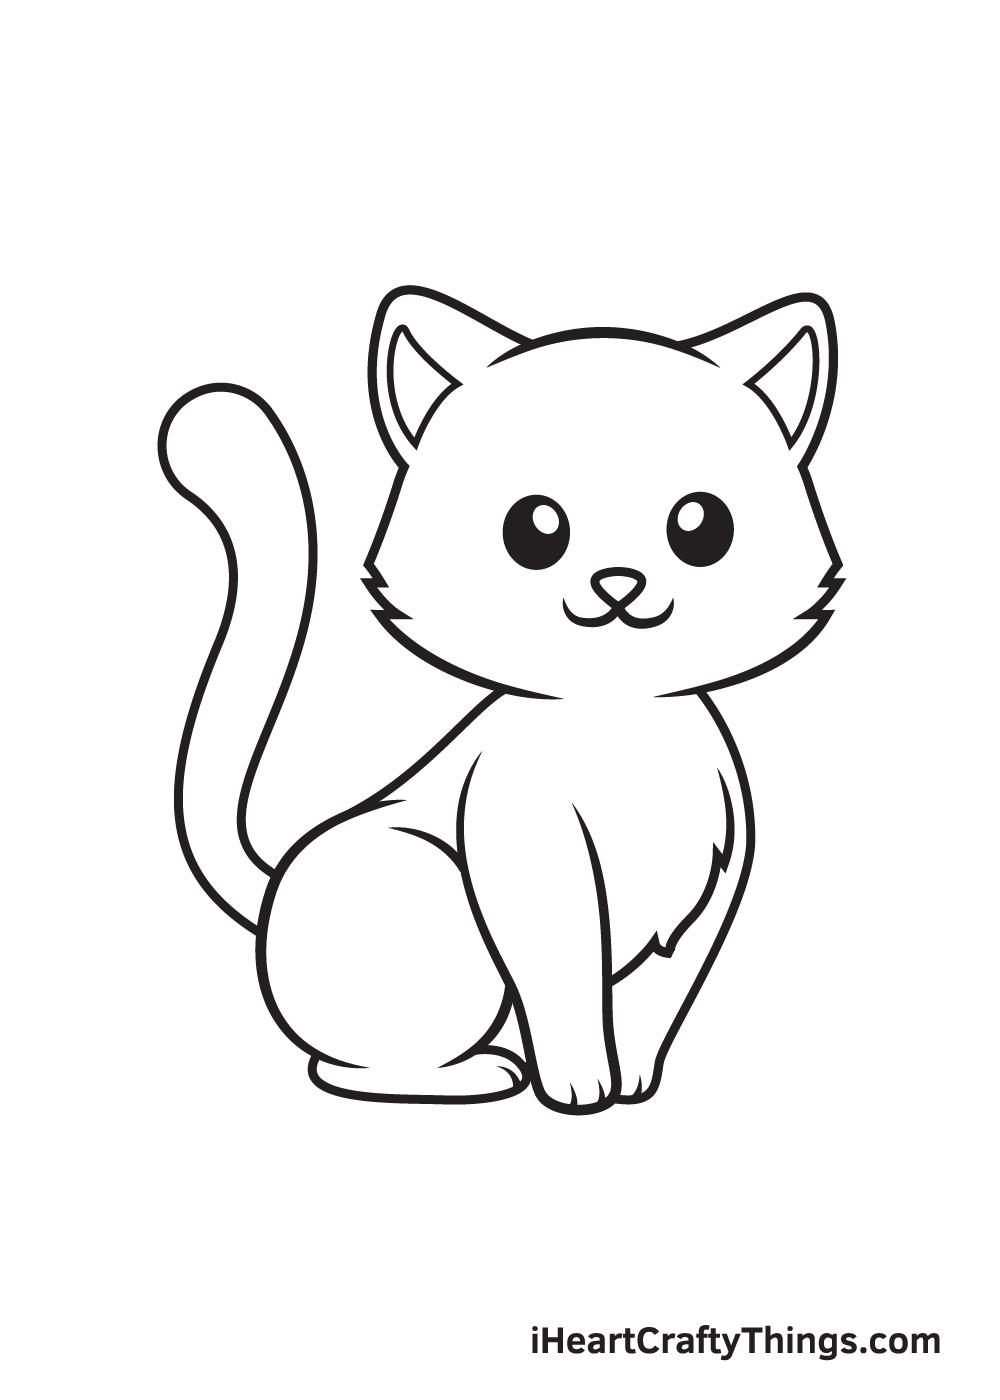 Kitten Drawing – Step 9